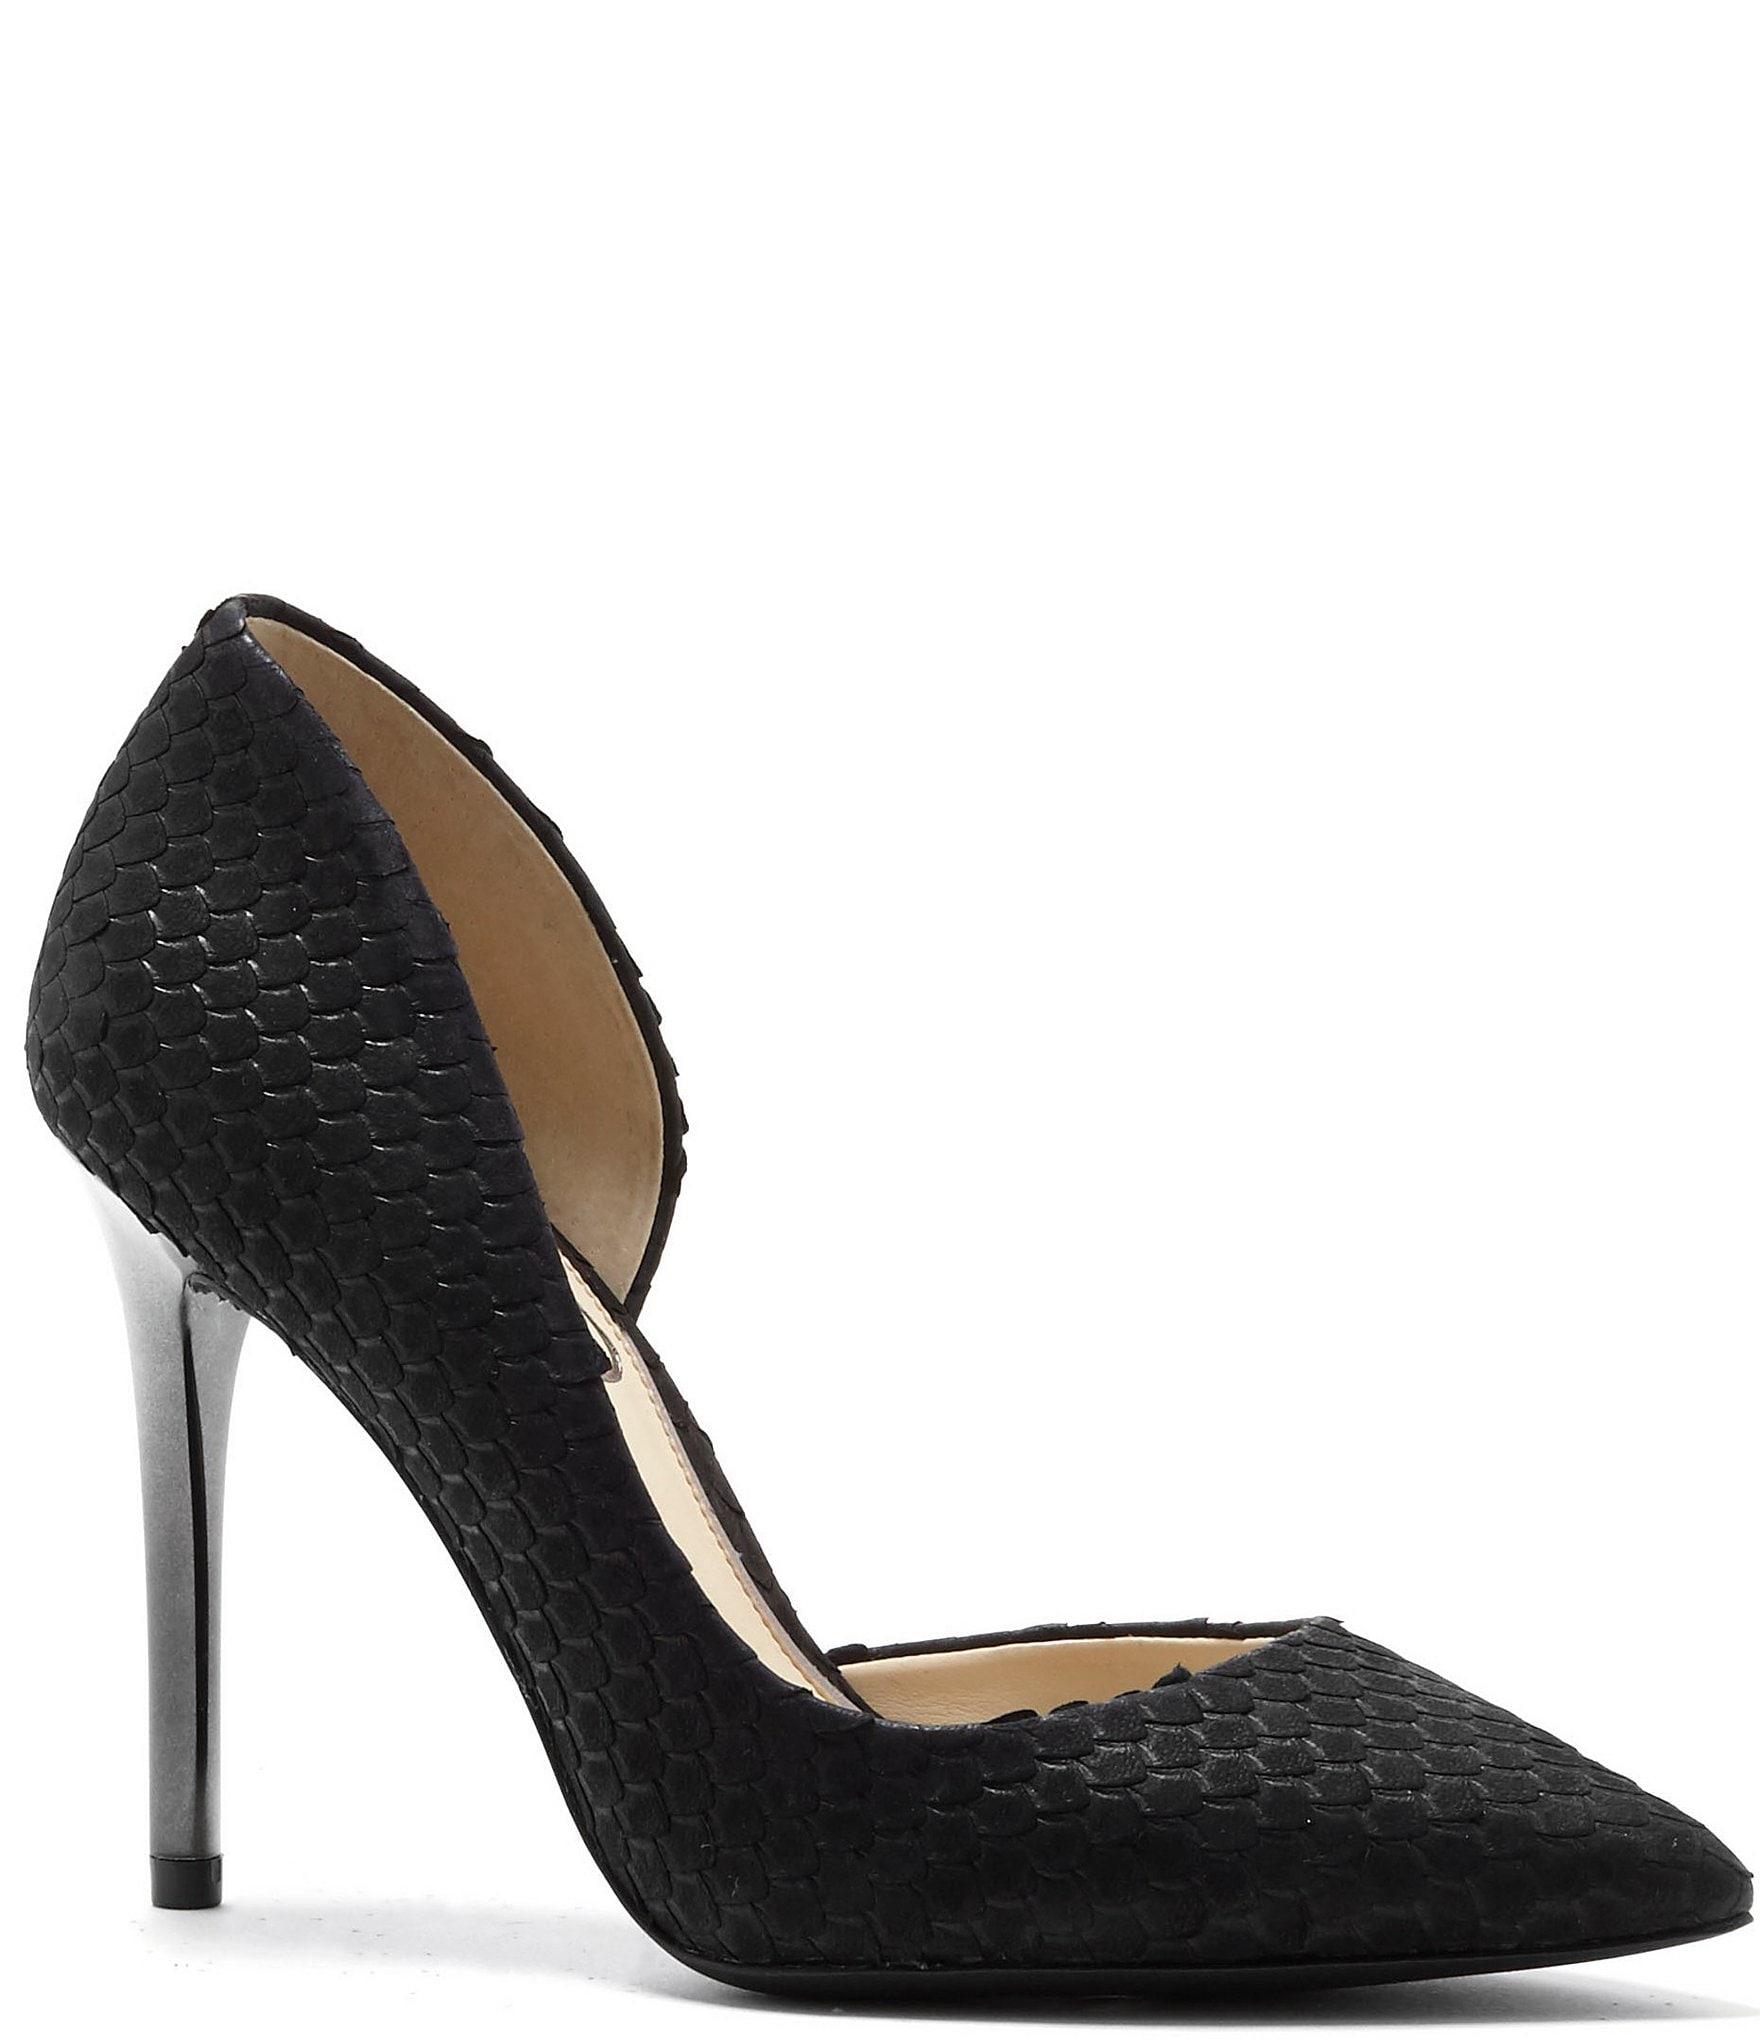 c38d00a616 Jessica Simpson Women s Extended Size Shoes